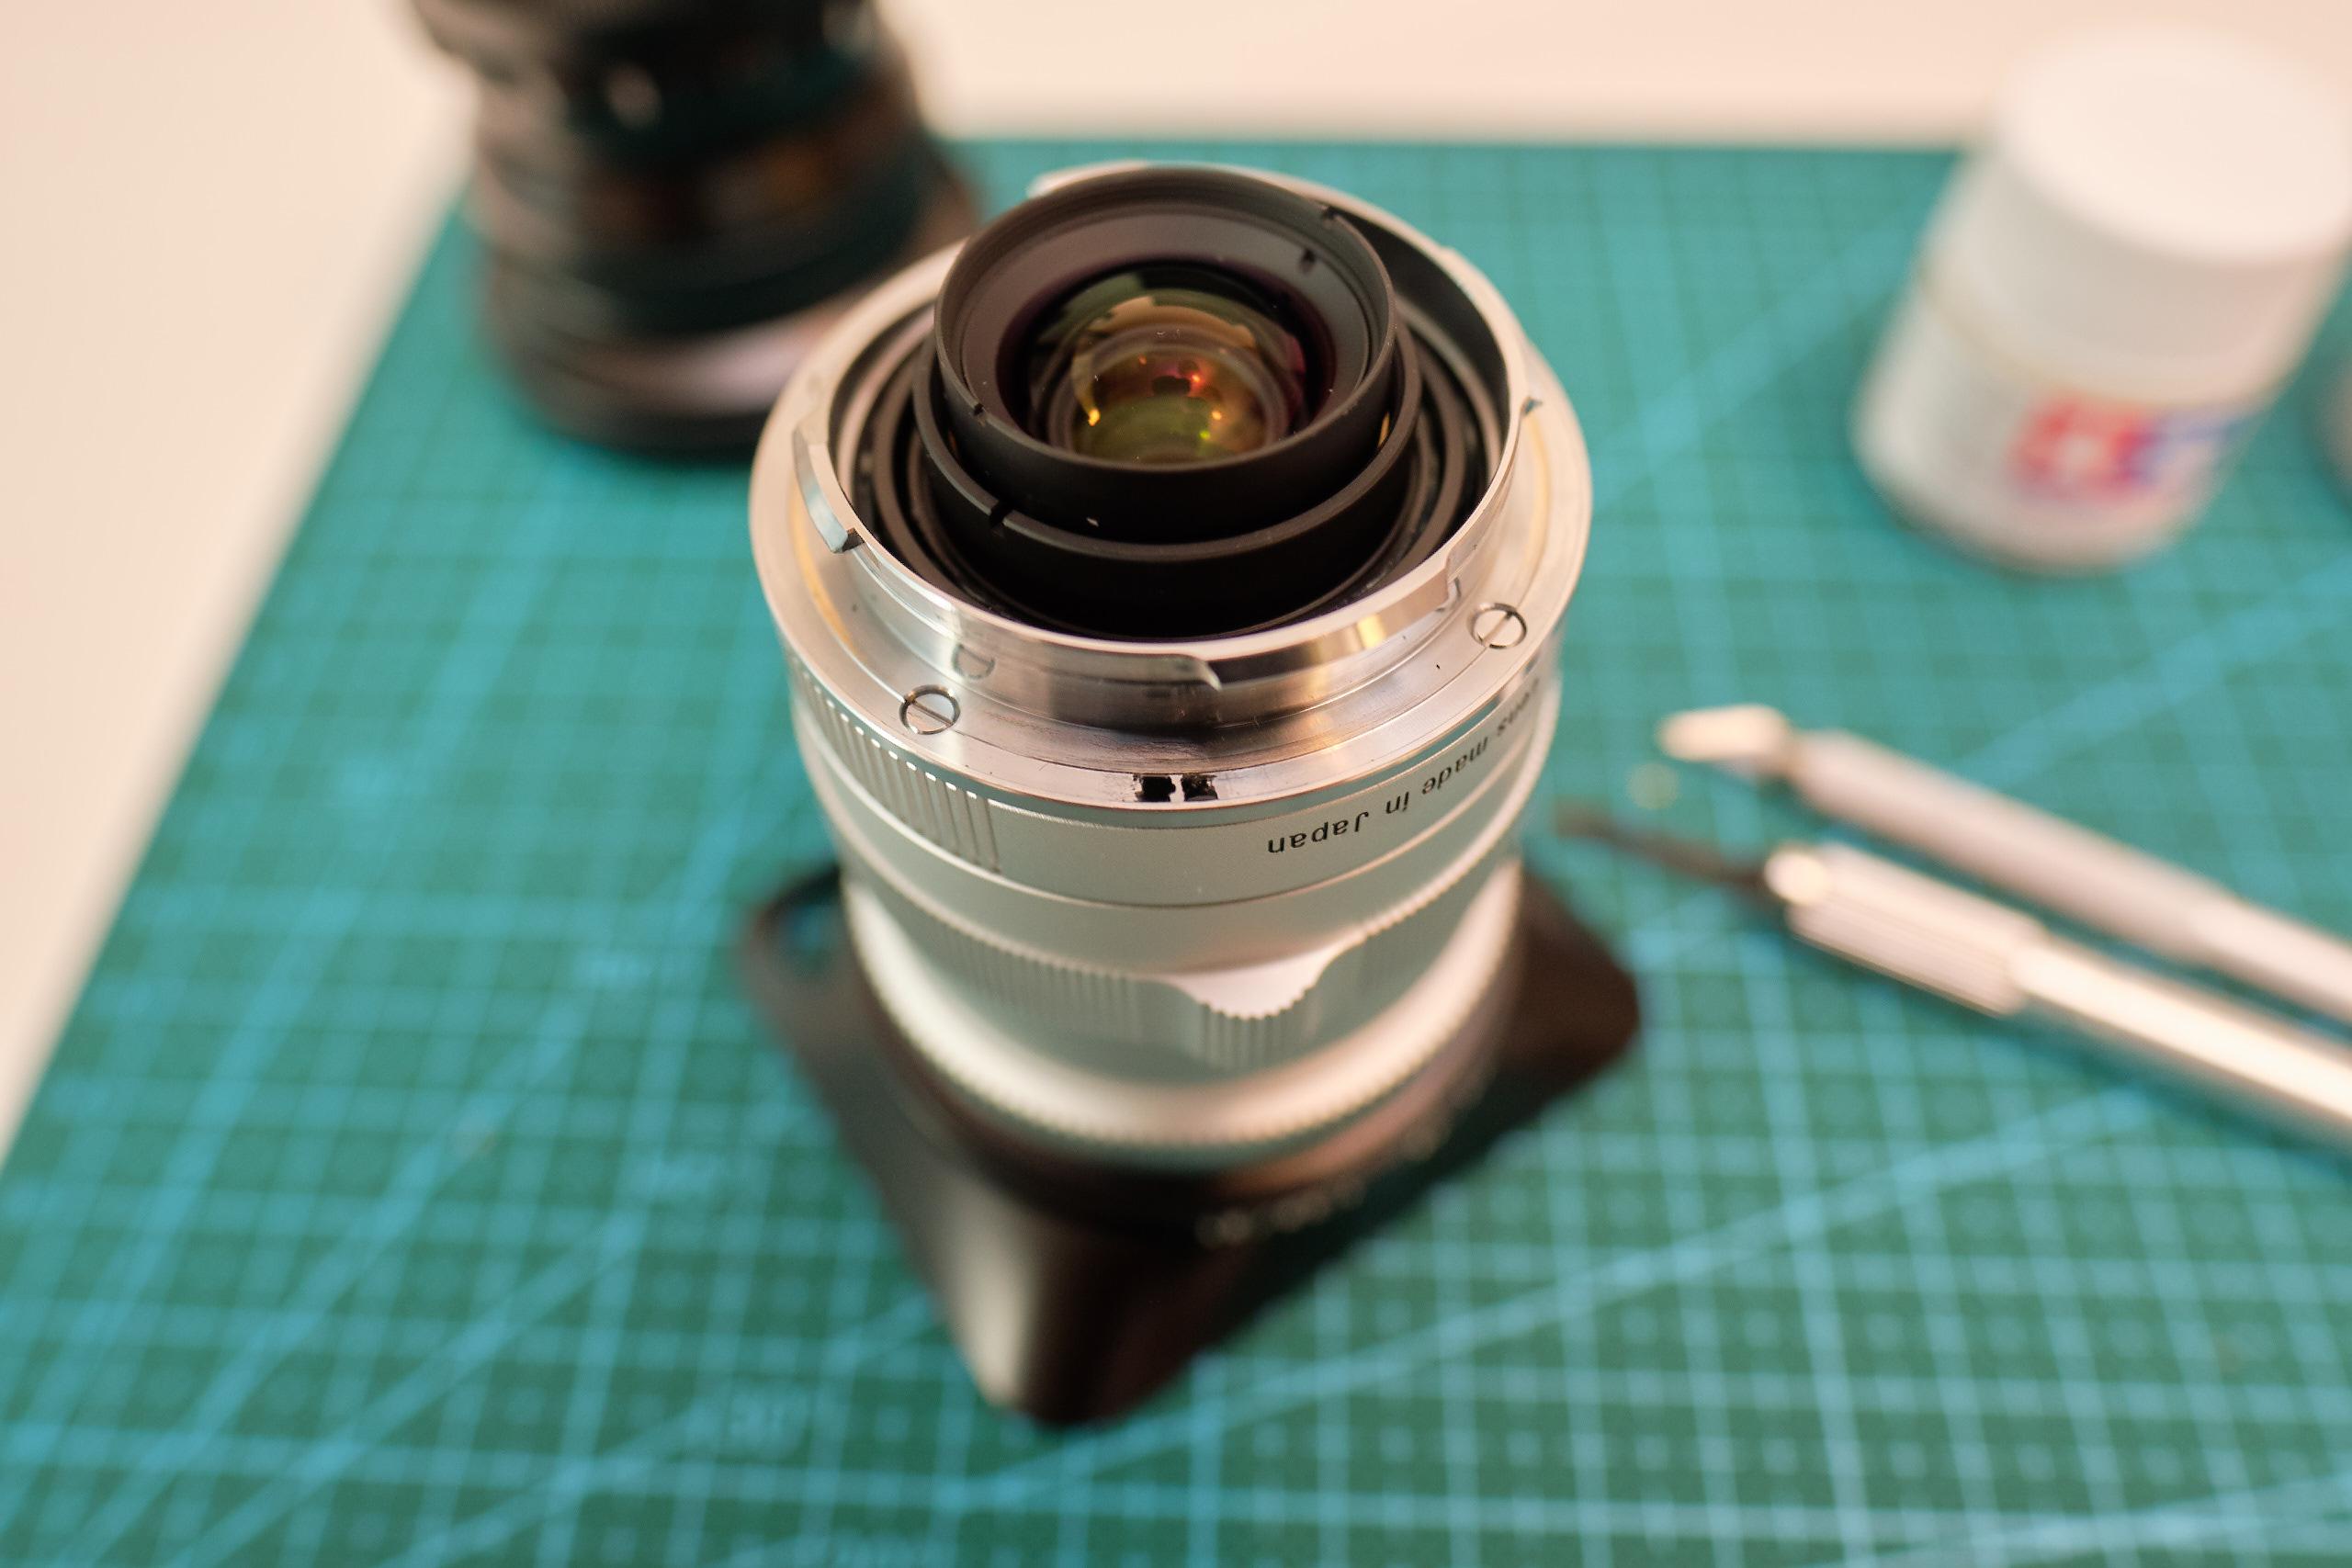 6-bit coding your lenses is not difficult: Leica Talk Forum